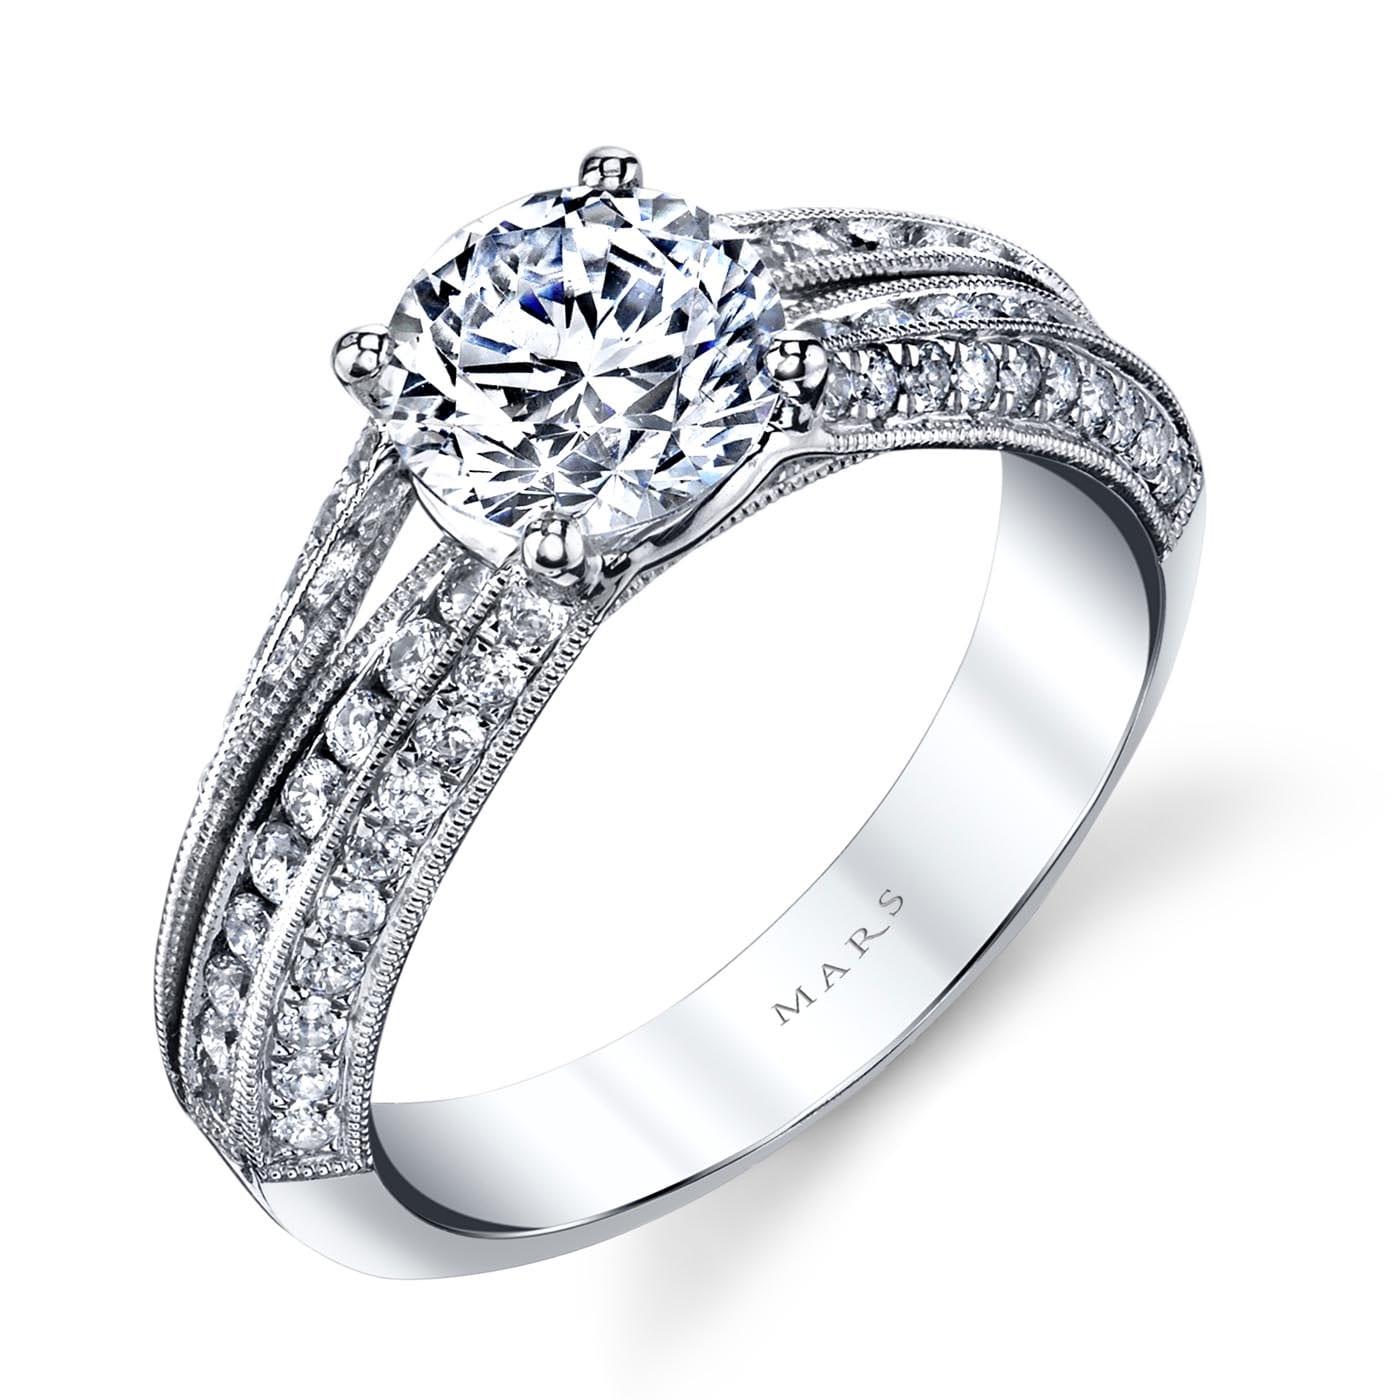 Vintage Engagement RingStyle #: MARS 25738